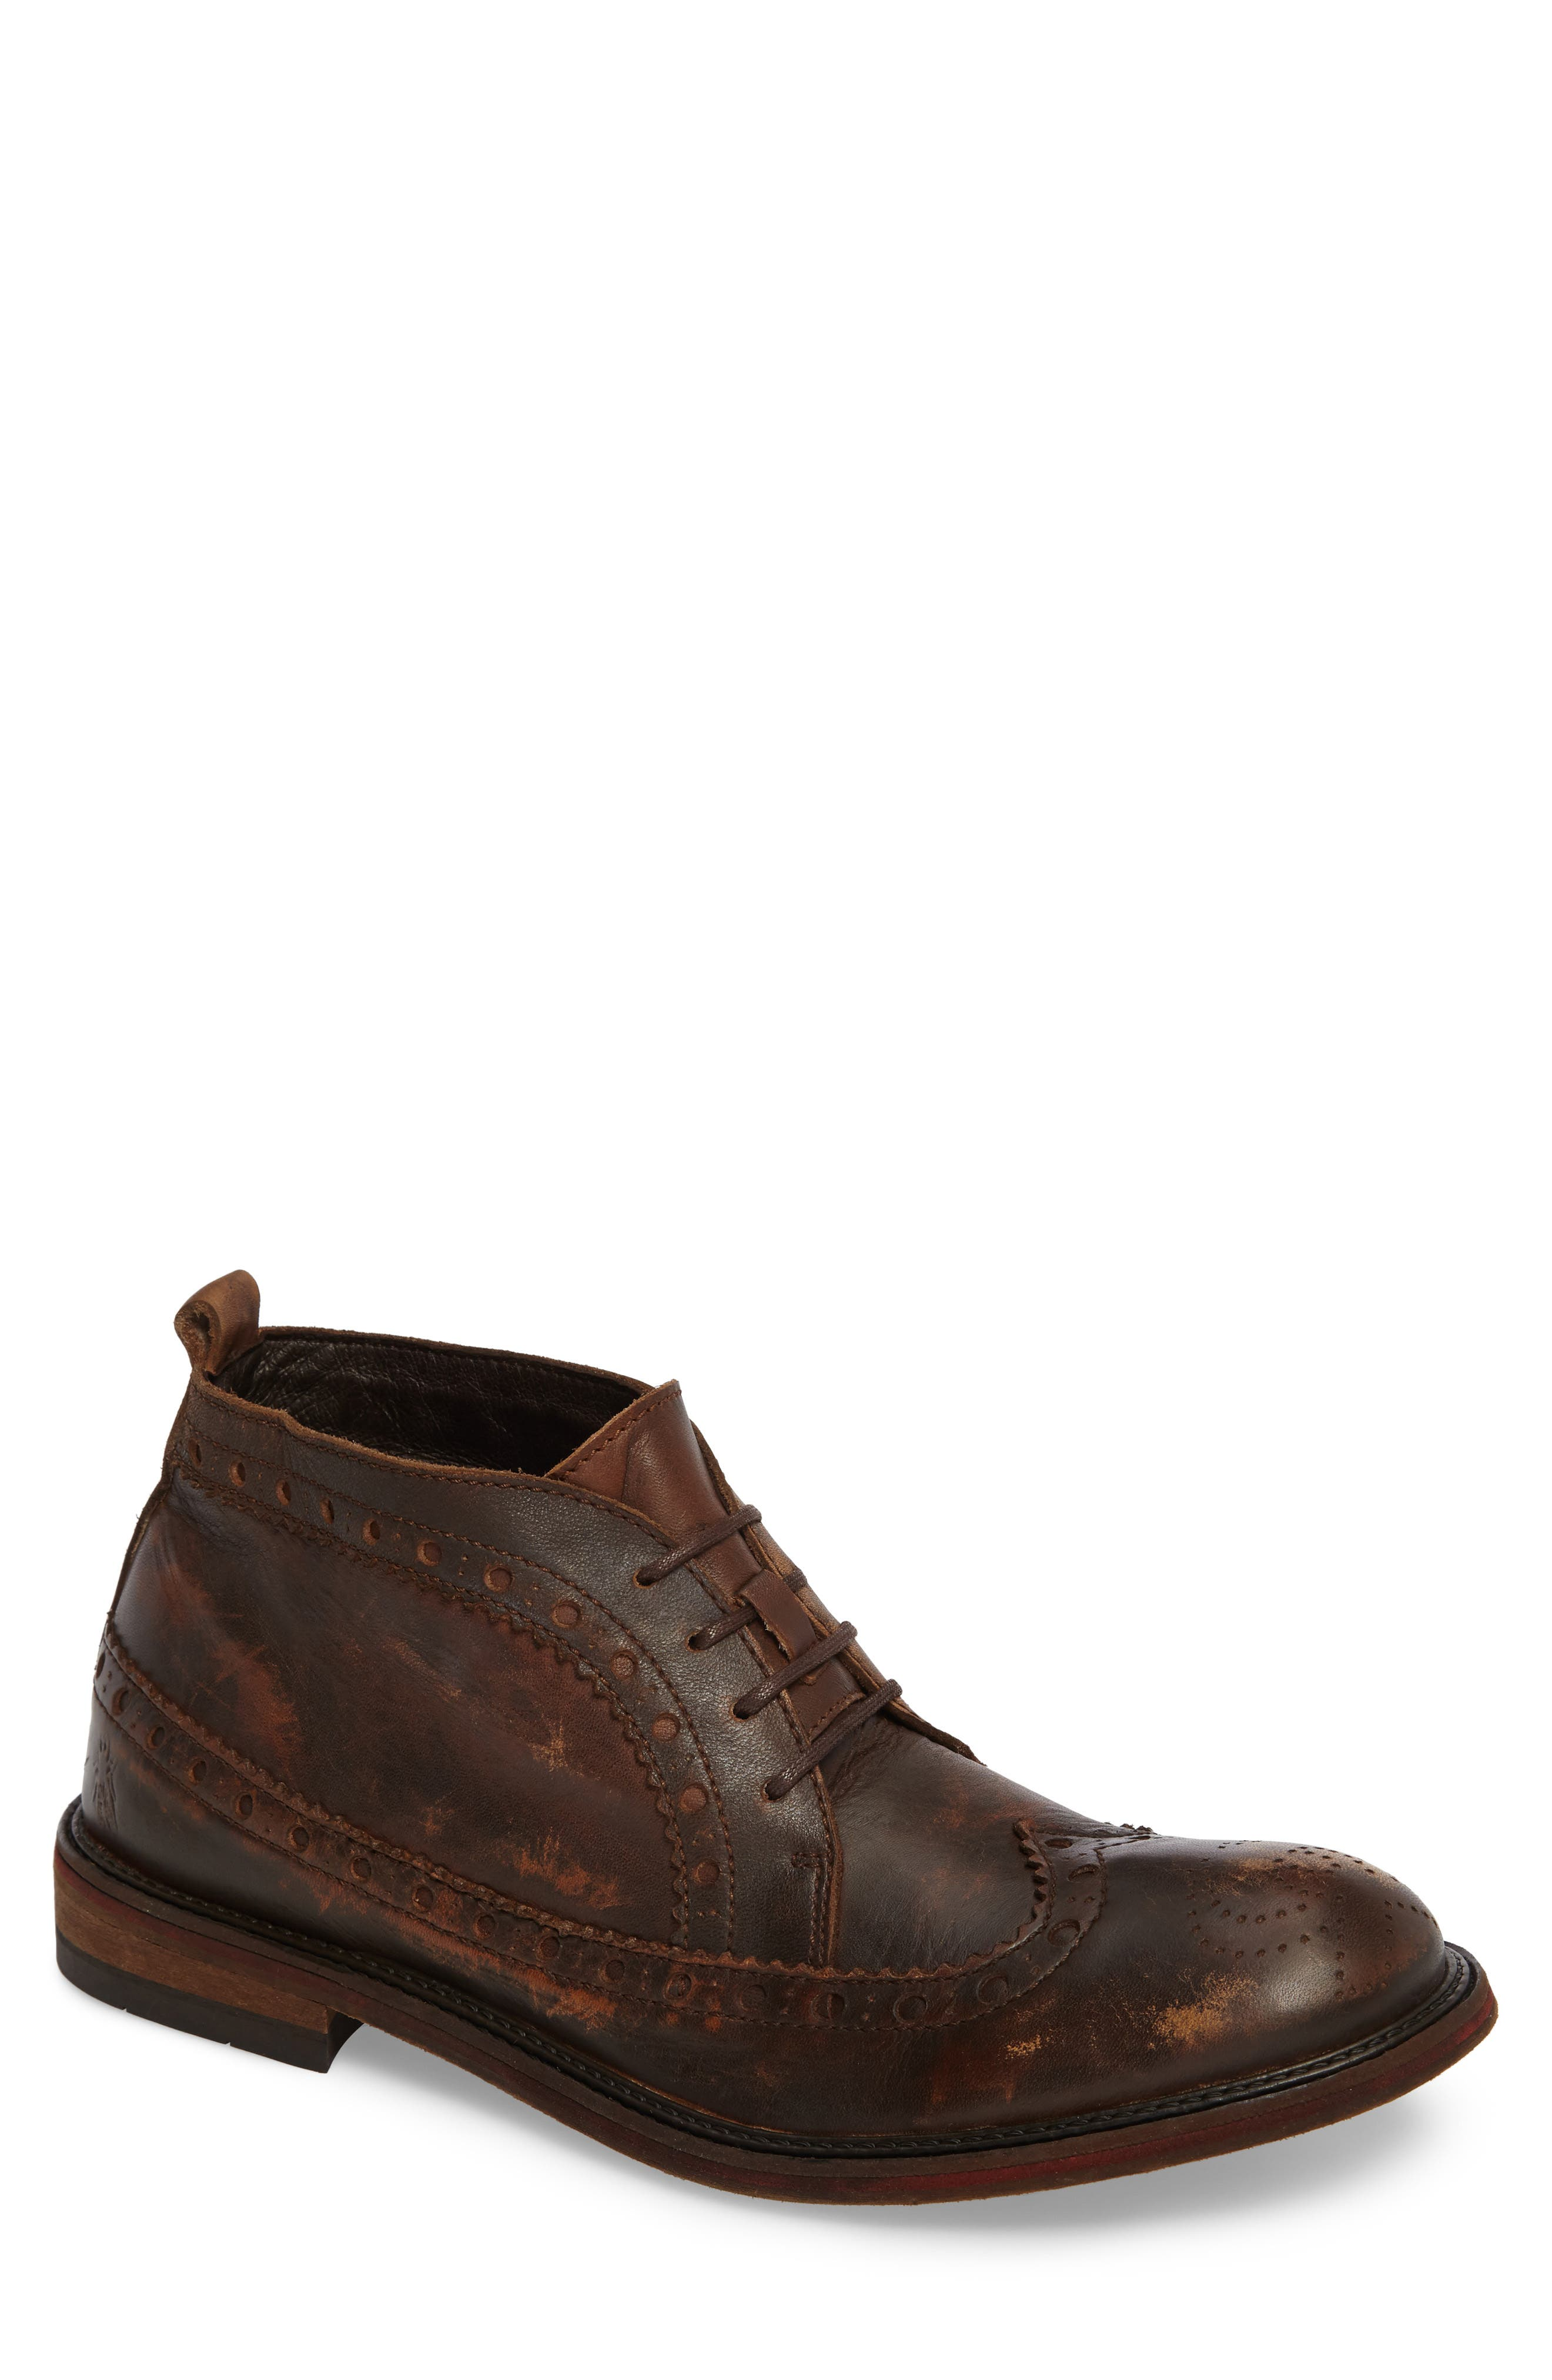 Main Image - Fly London Wile Wingtip Chukka Boot (Men)